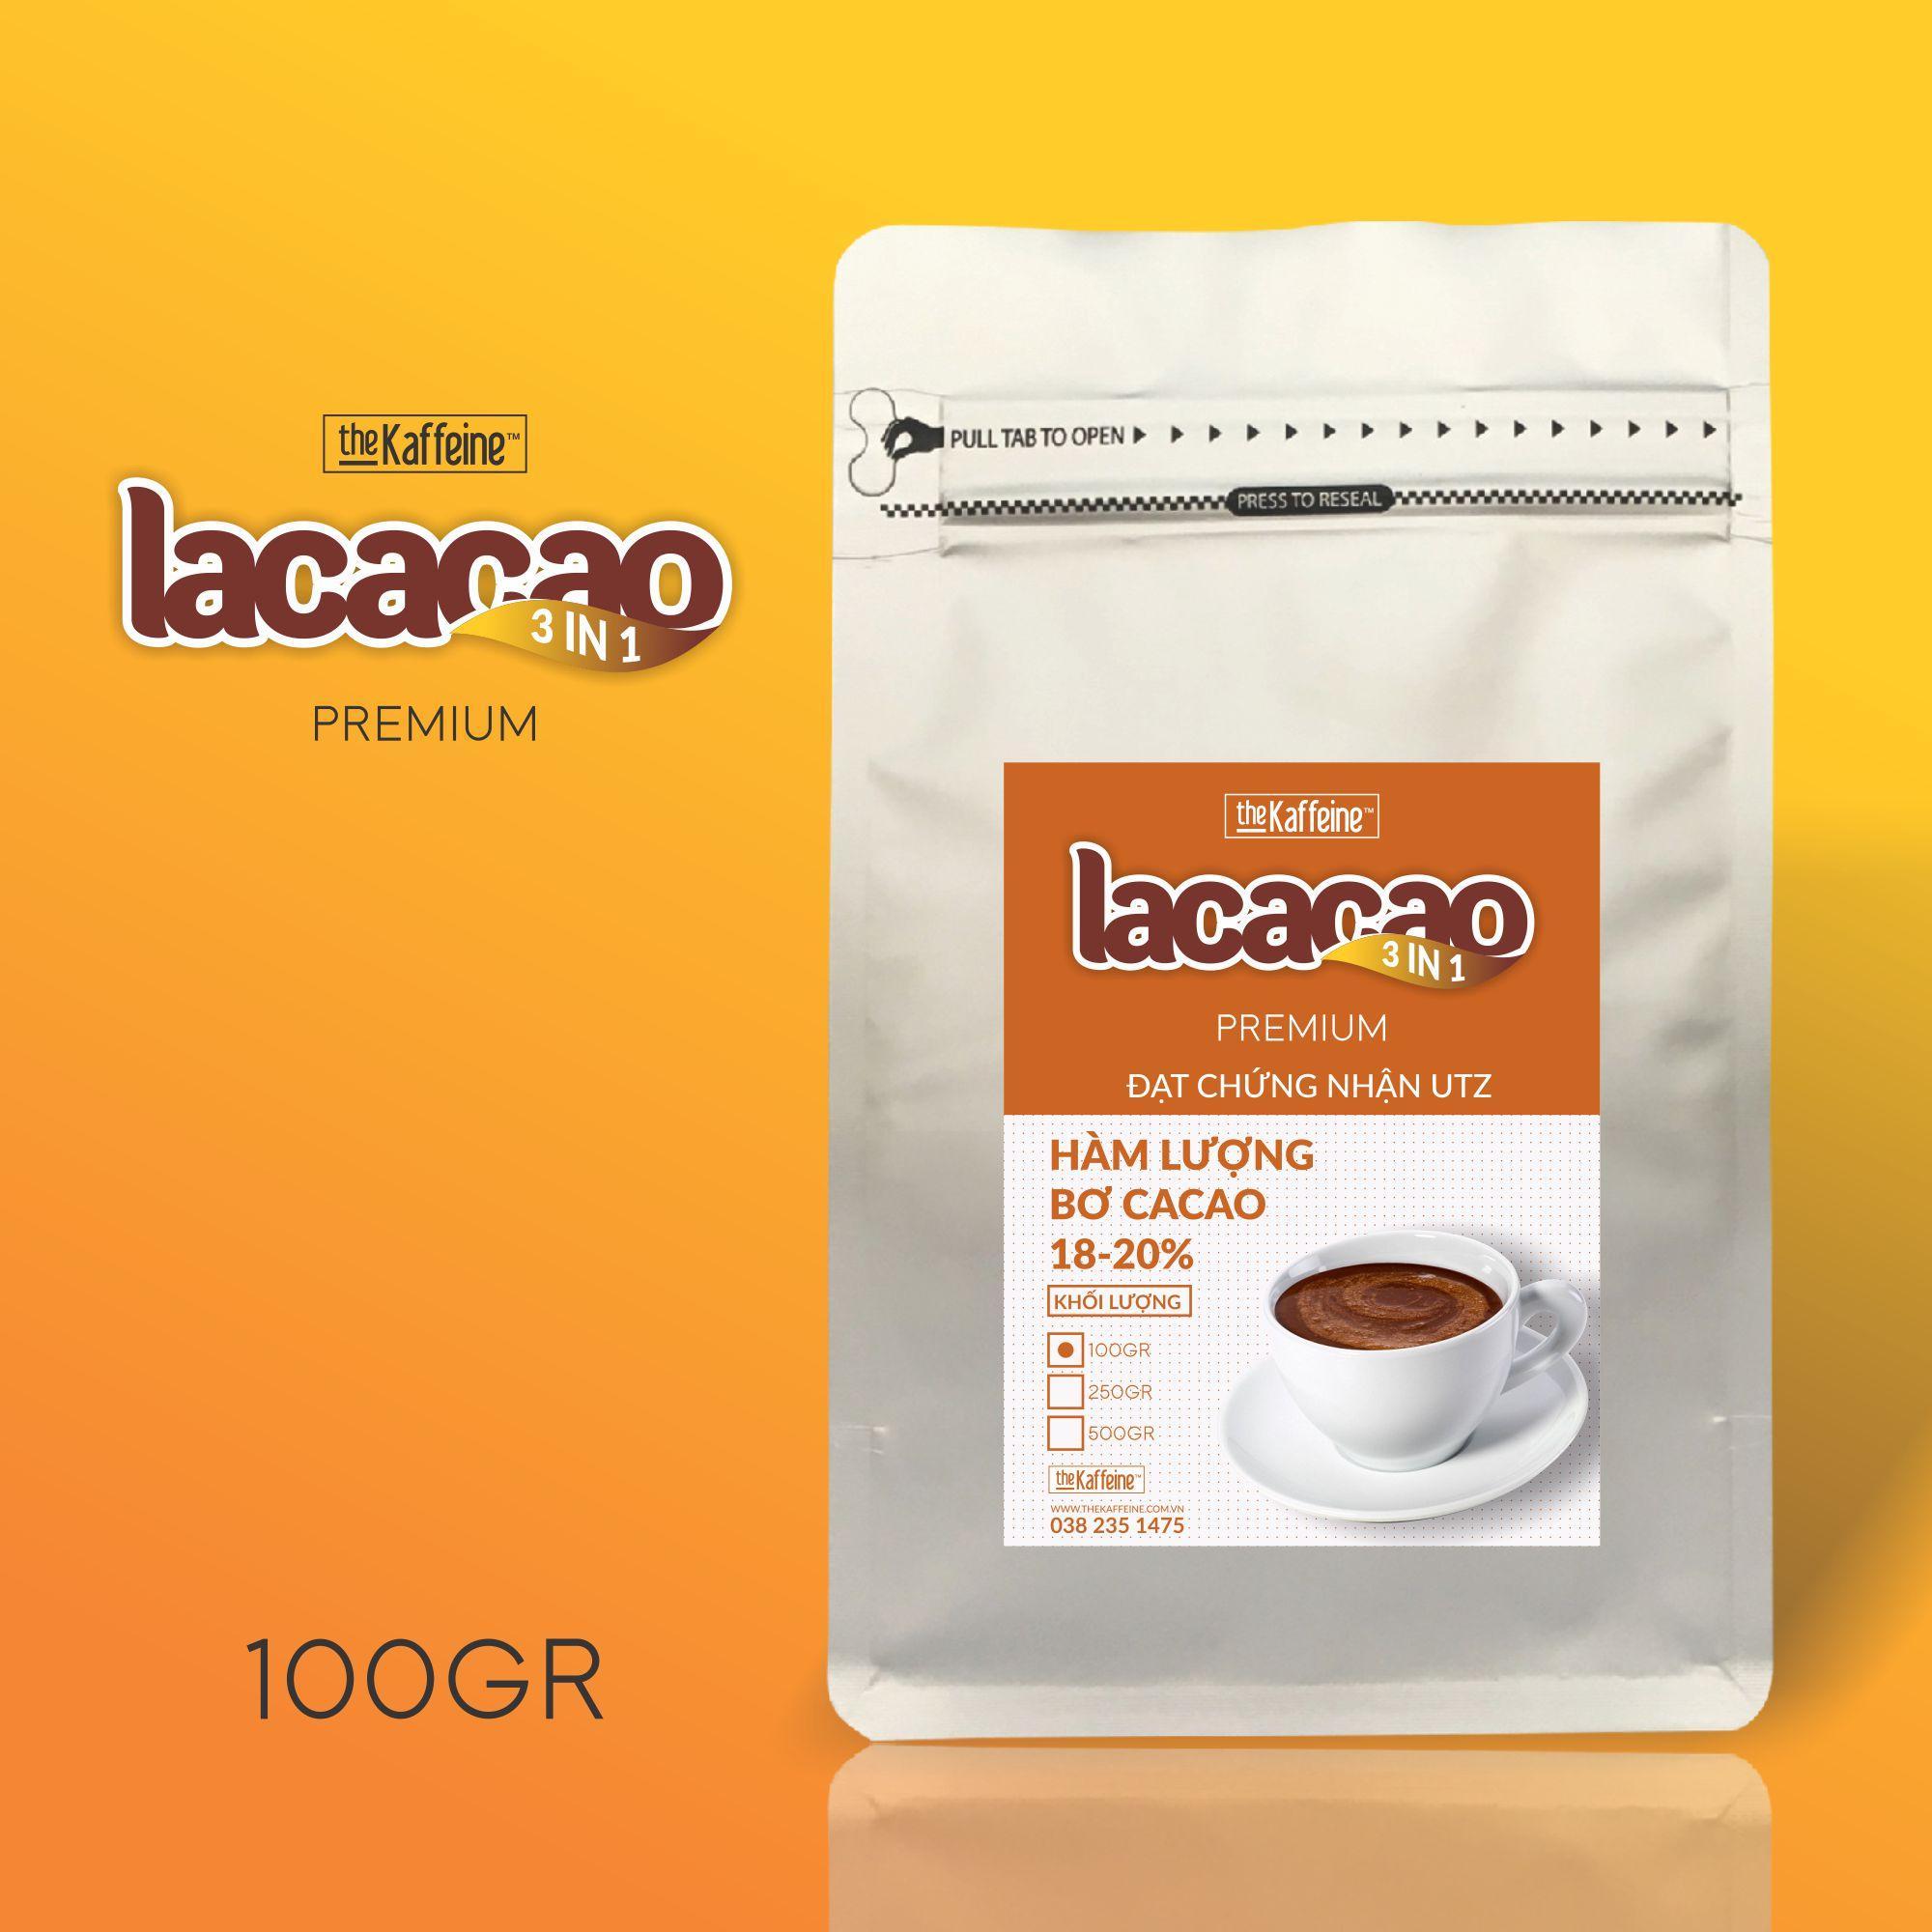 Cacao Sữa LACACAO PREMIUM 3in1 100g - The Kaffeine